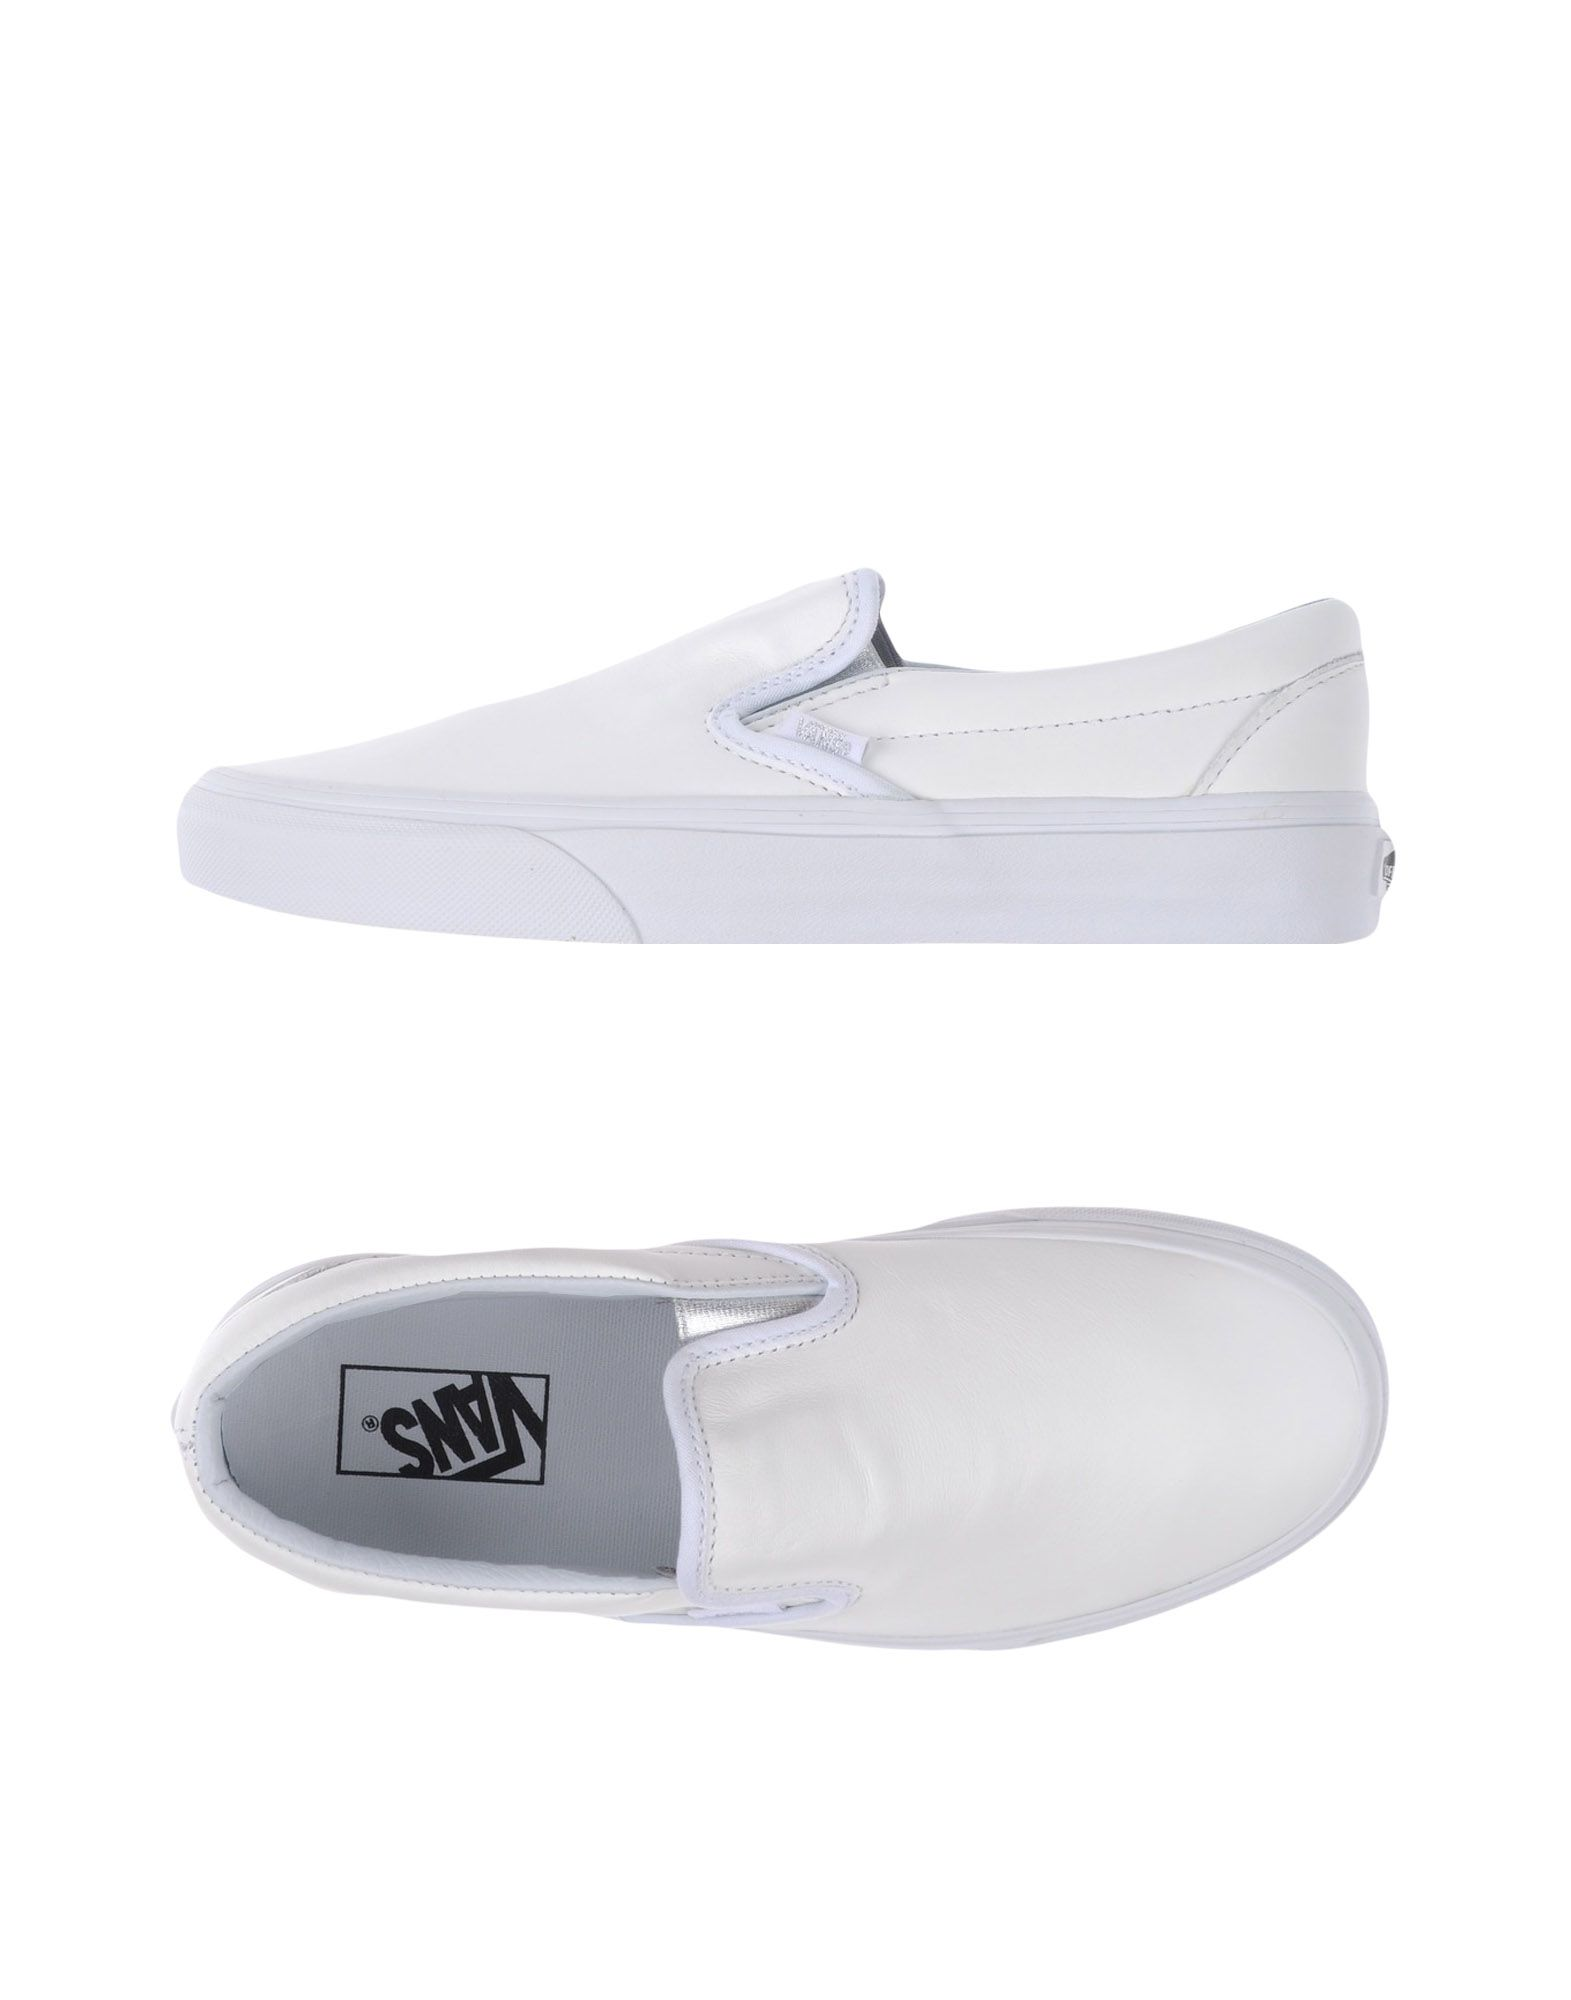 Sneakers Vans U Classic Slip-On Metallic Gore - Femme - Sneakers Vans sur